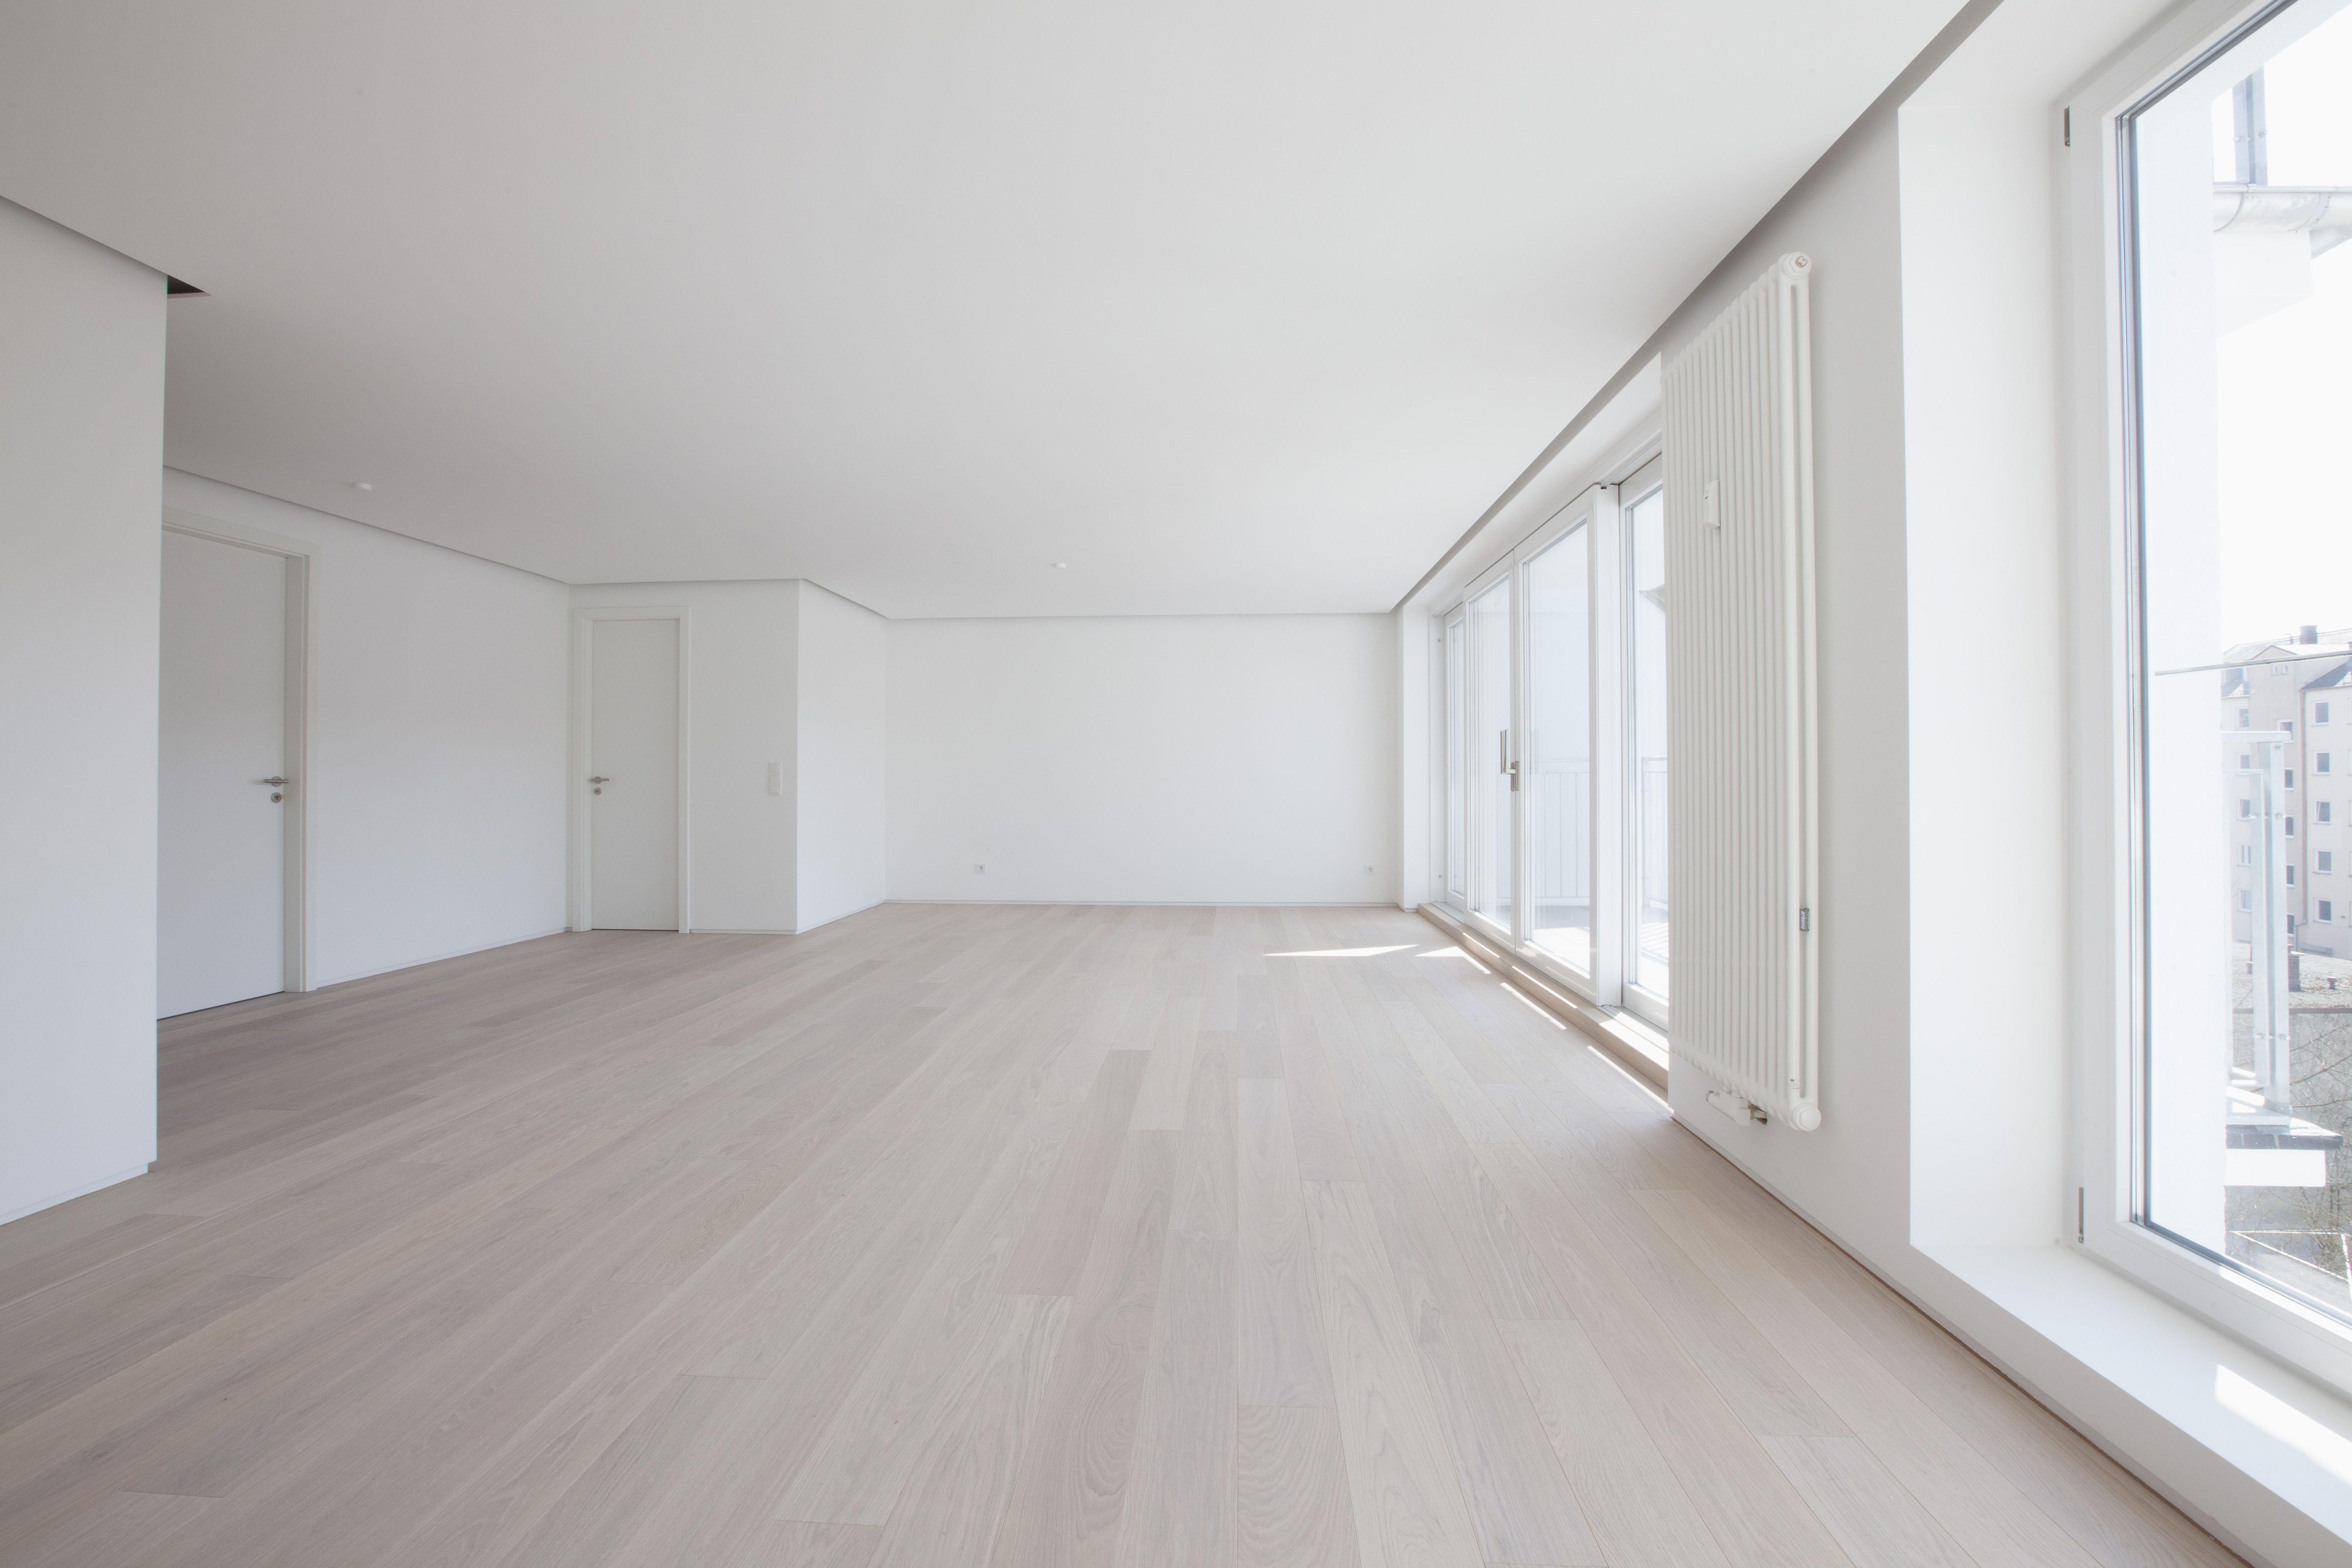 installing 3 8 hardwood floors of basics of favorite hybrid engineered wood floors throughout empty living room in modern apartment 578189139 58866f903df78c2ccdecab05